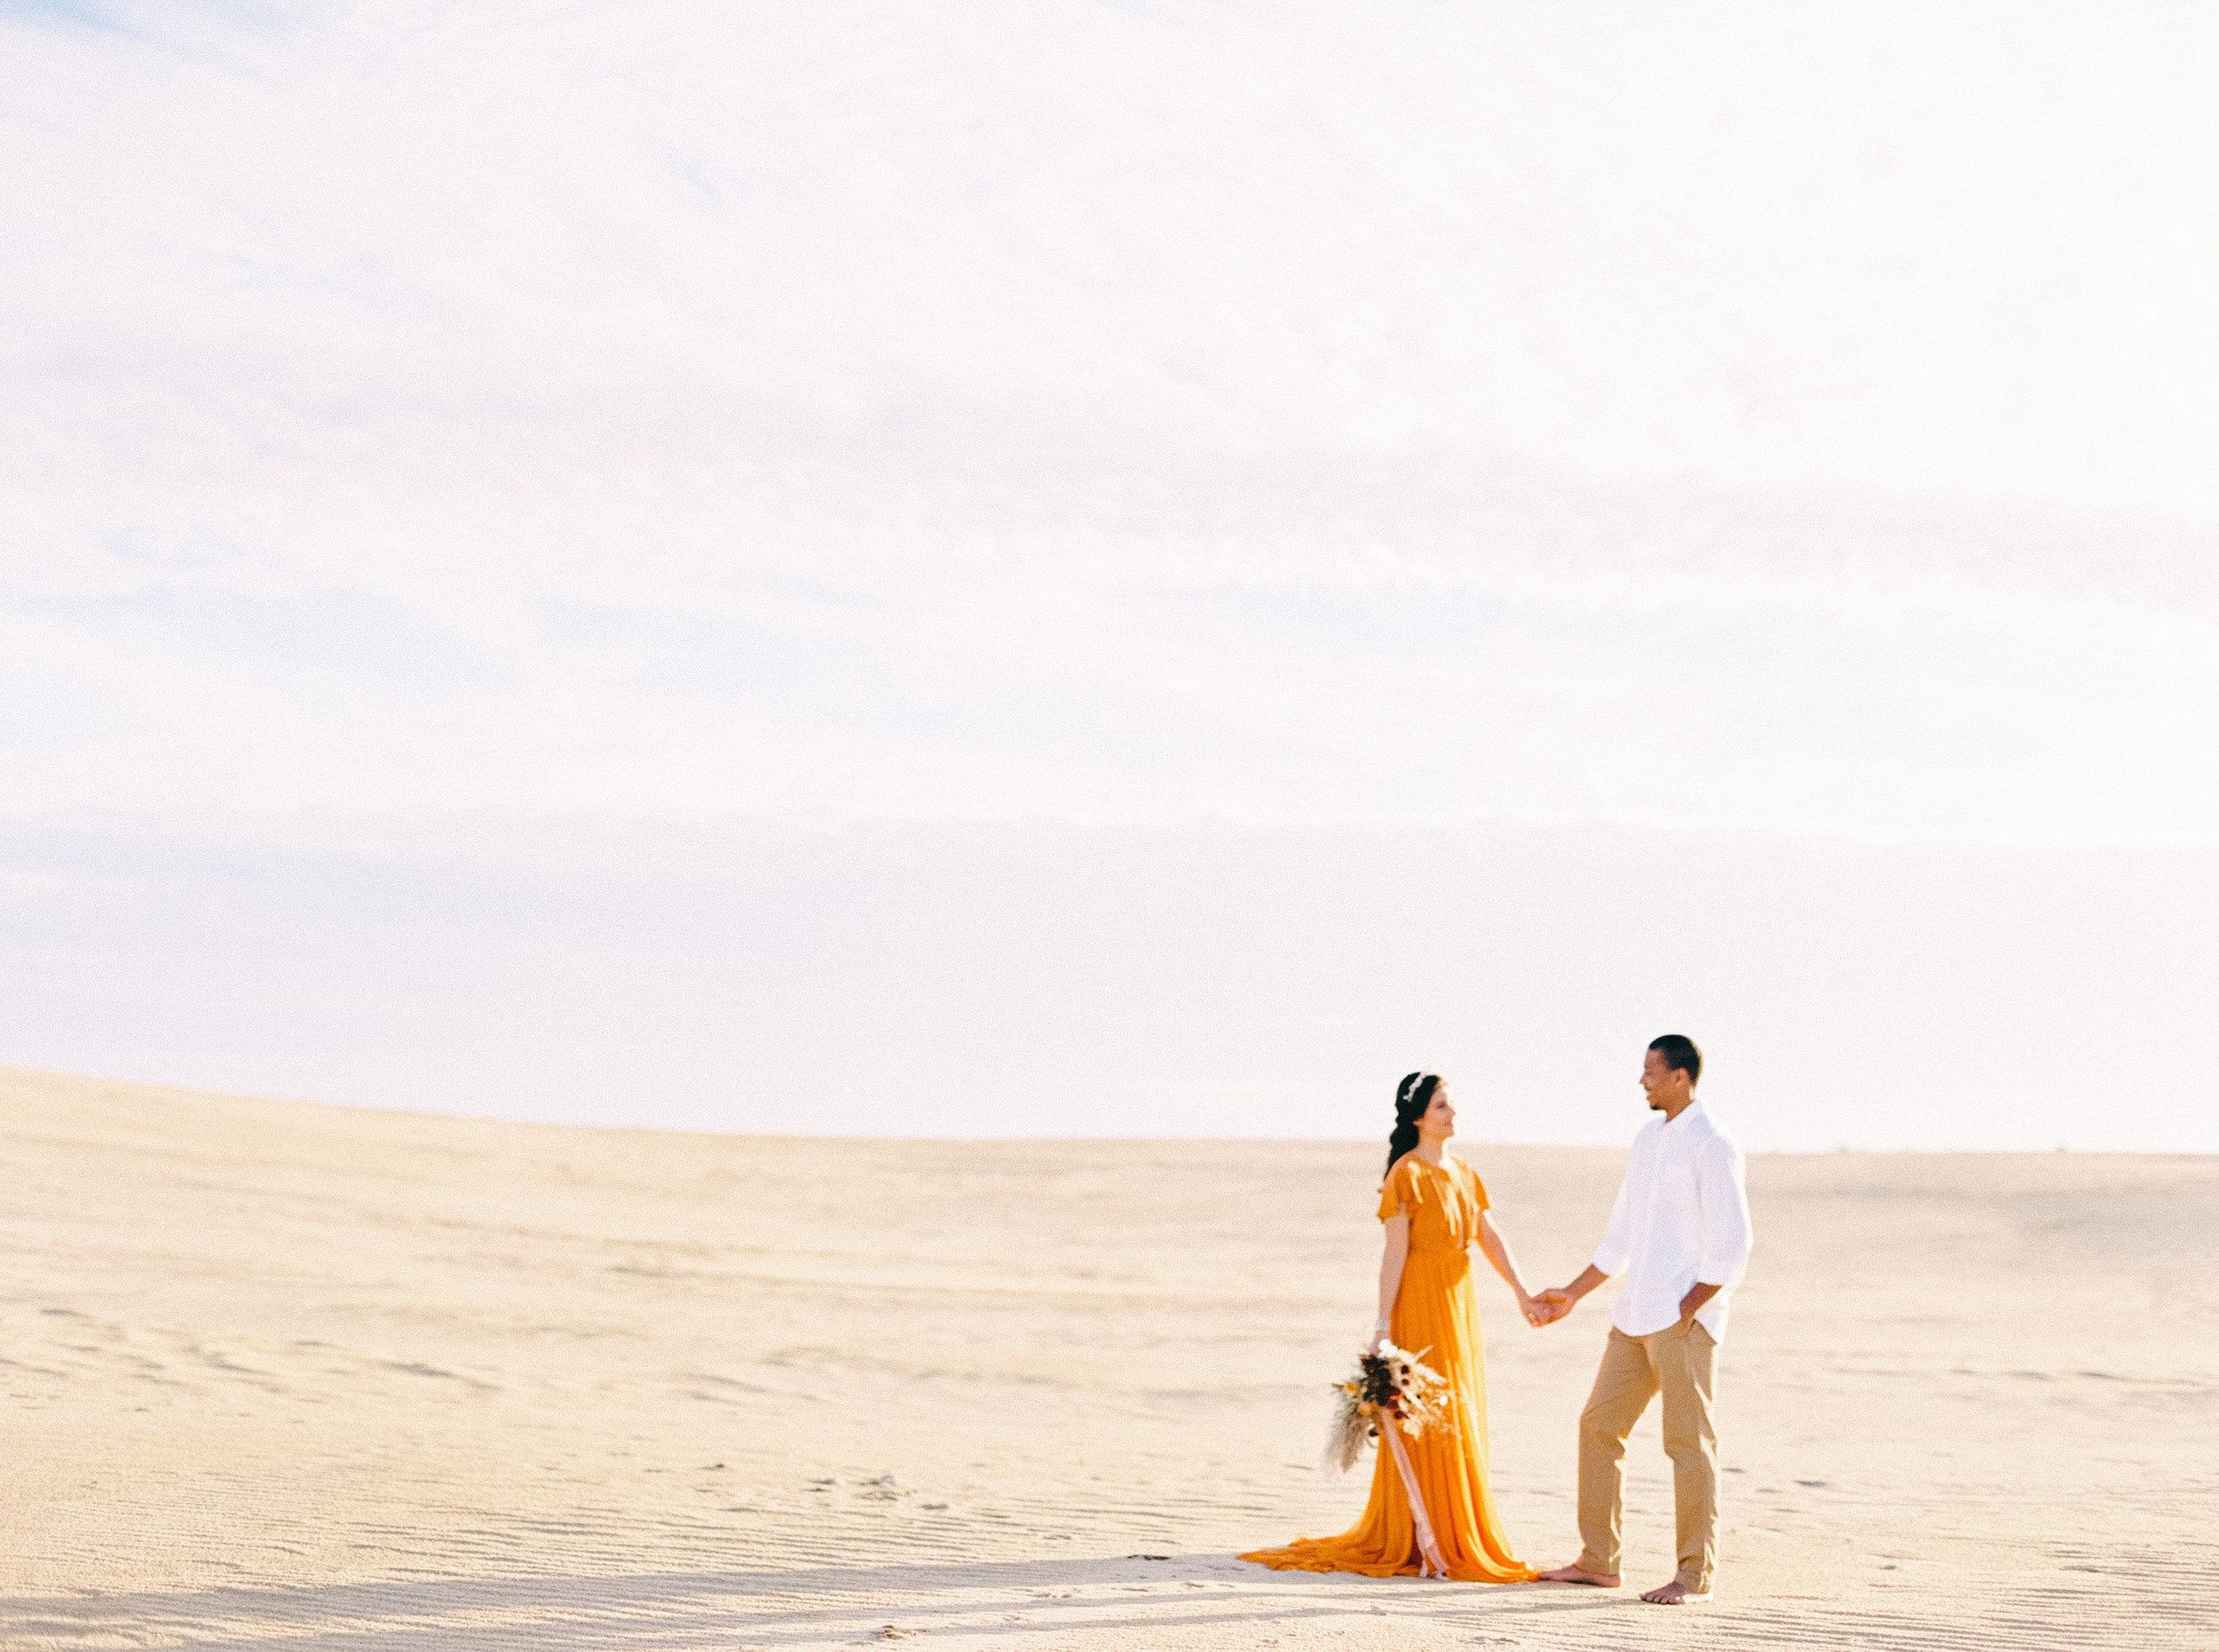 NikkiSanterre_FineArtFilmWeddingPhotographer_WeddingSparrowEditorial_AisleSociety_DesertEngagementSession-1.jpg